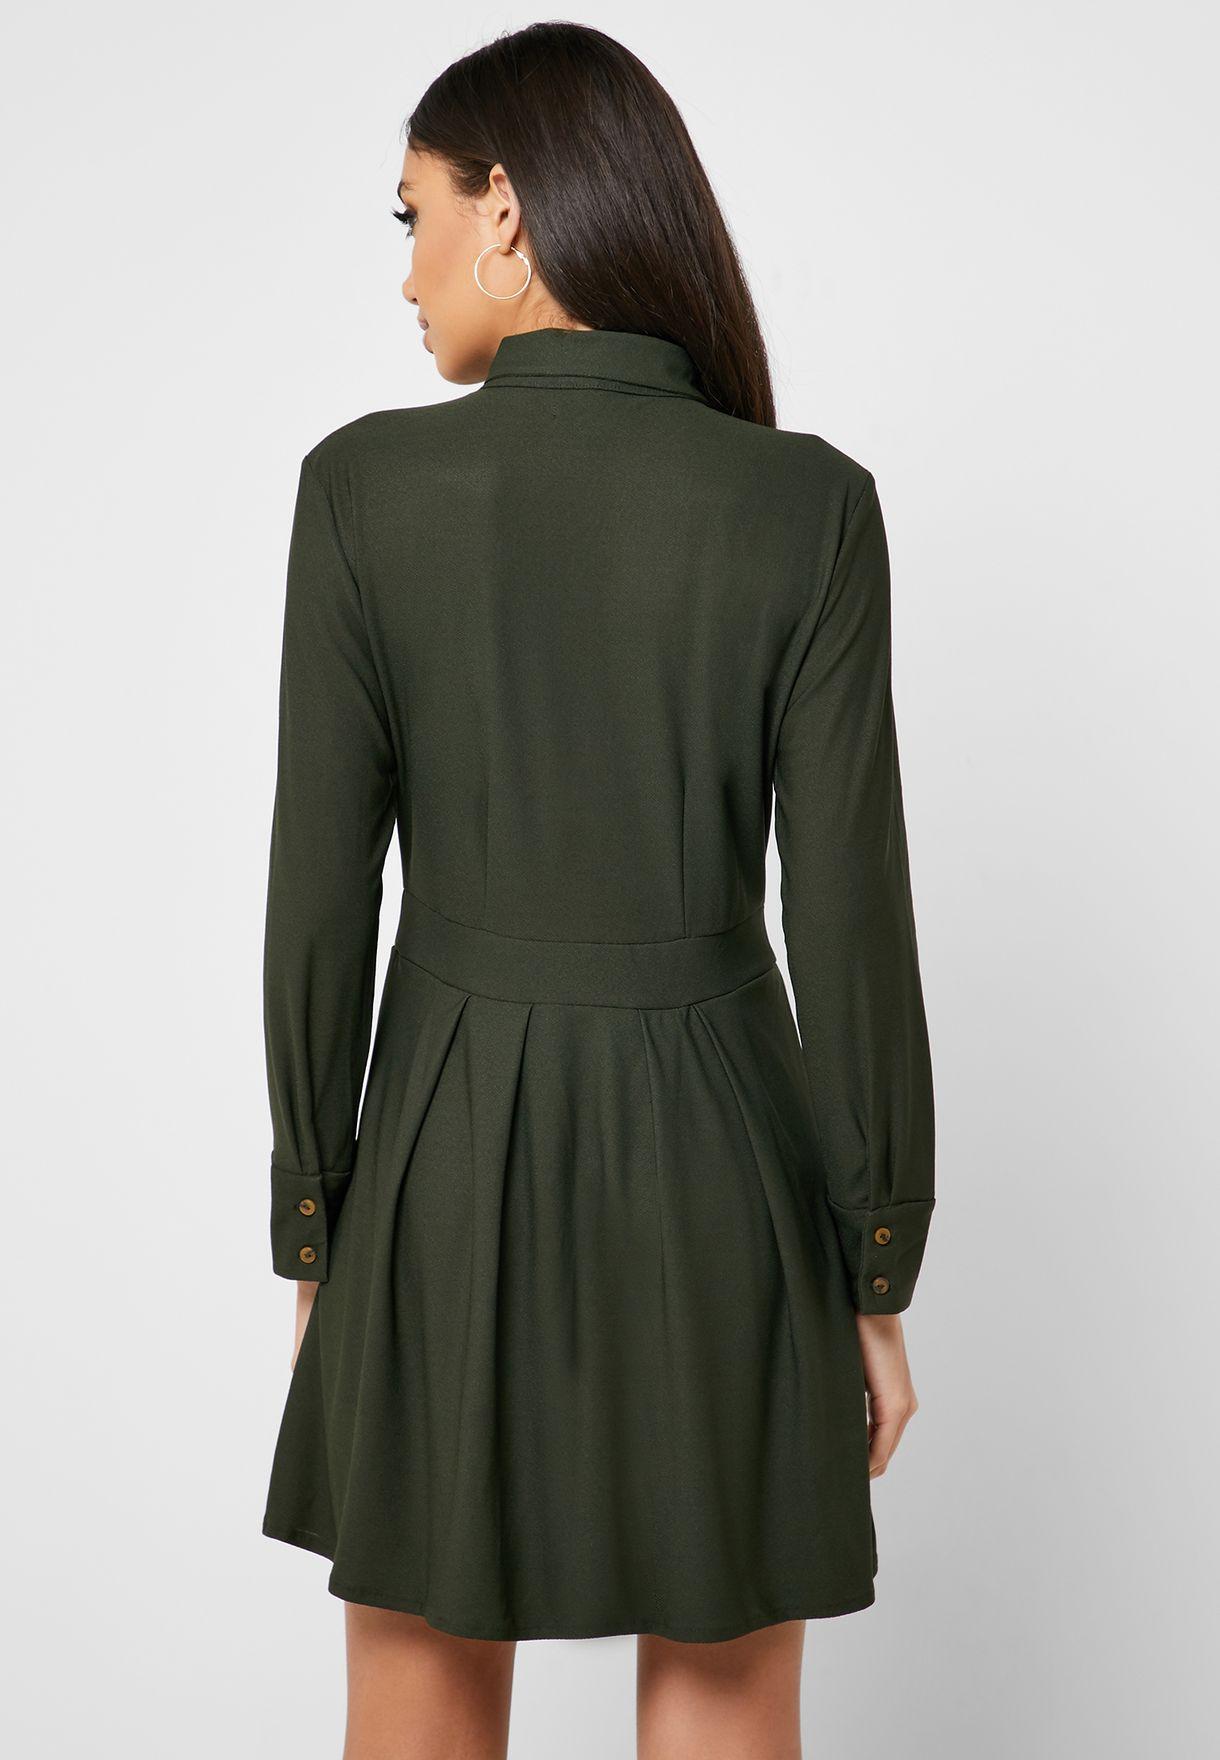 Reserved Pleated Mini Shirt Dress - Fashion